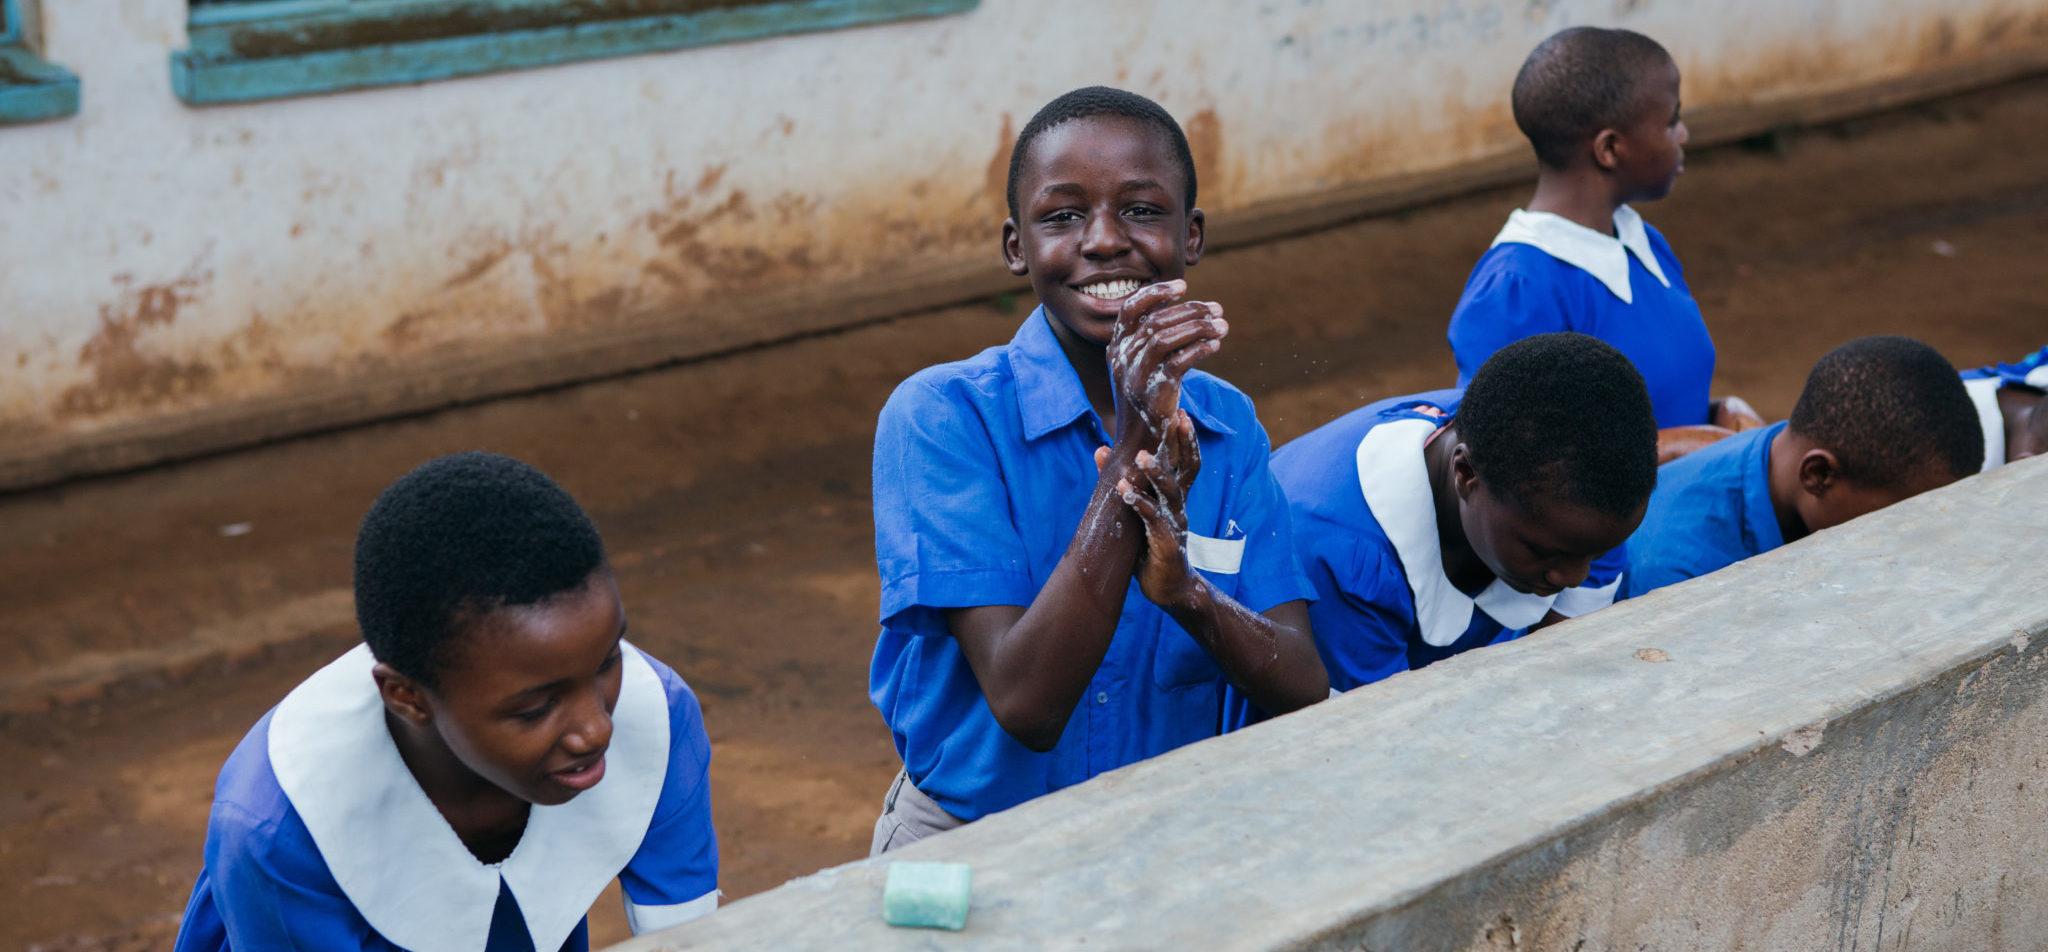 Malawi_Blantyre_2016_Chilomoni_LEA_School_ChilomoniLEASchool (1)